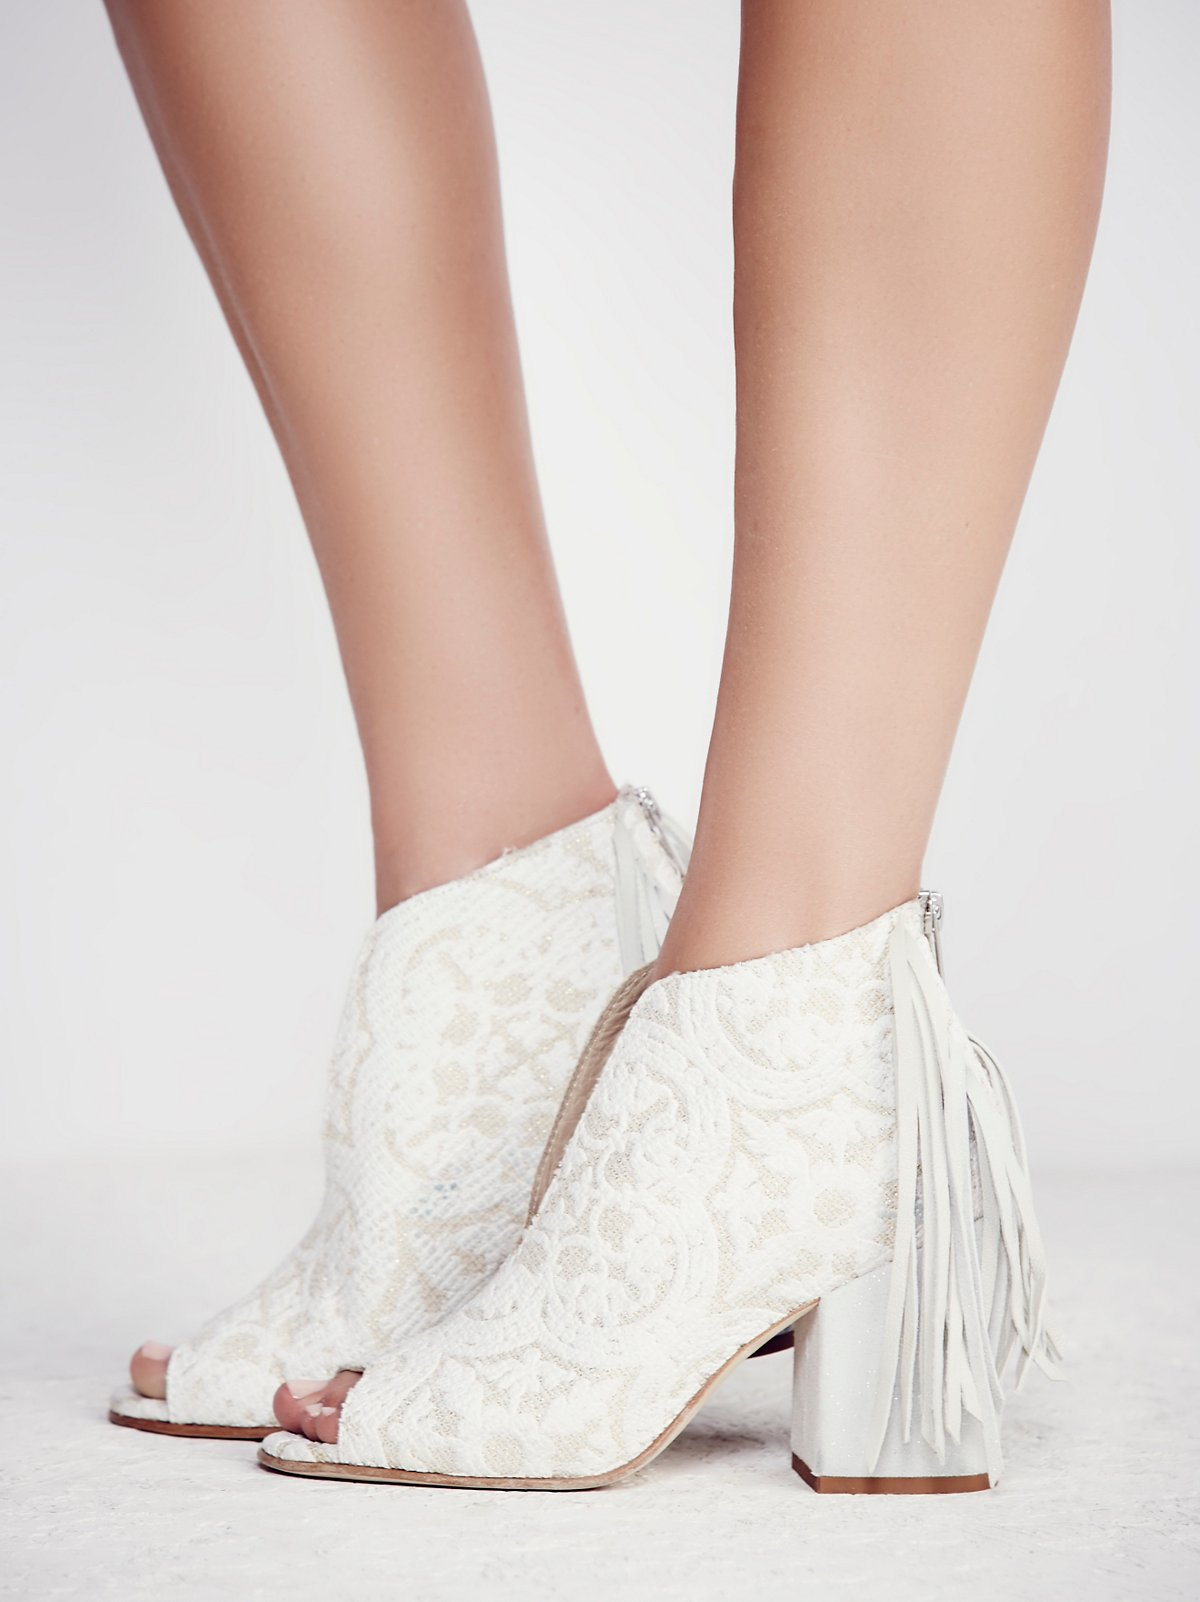 Stars Aligned踝靴